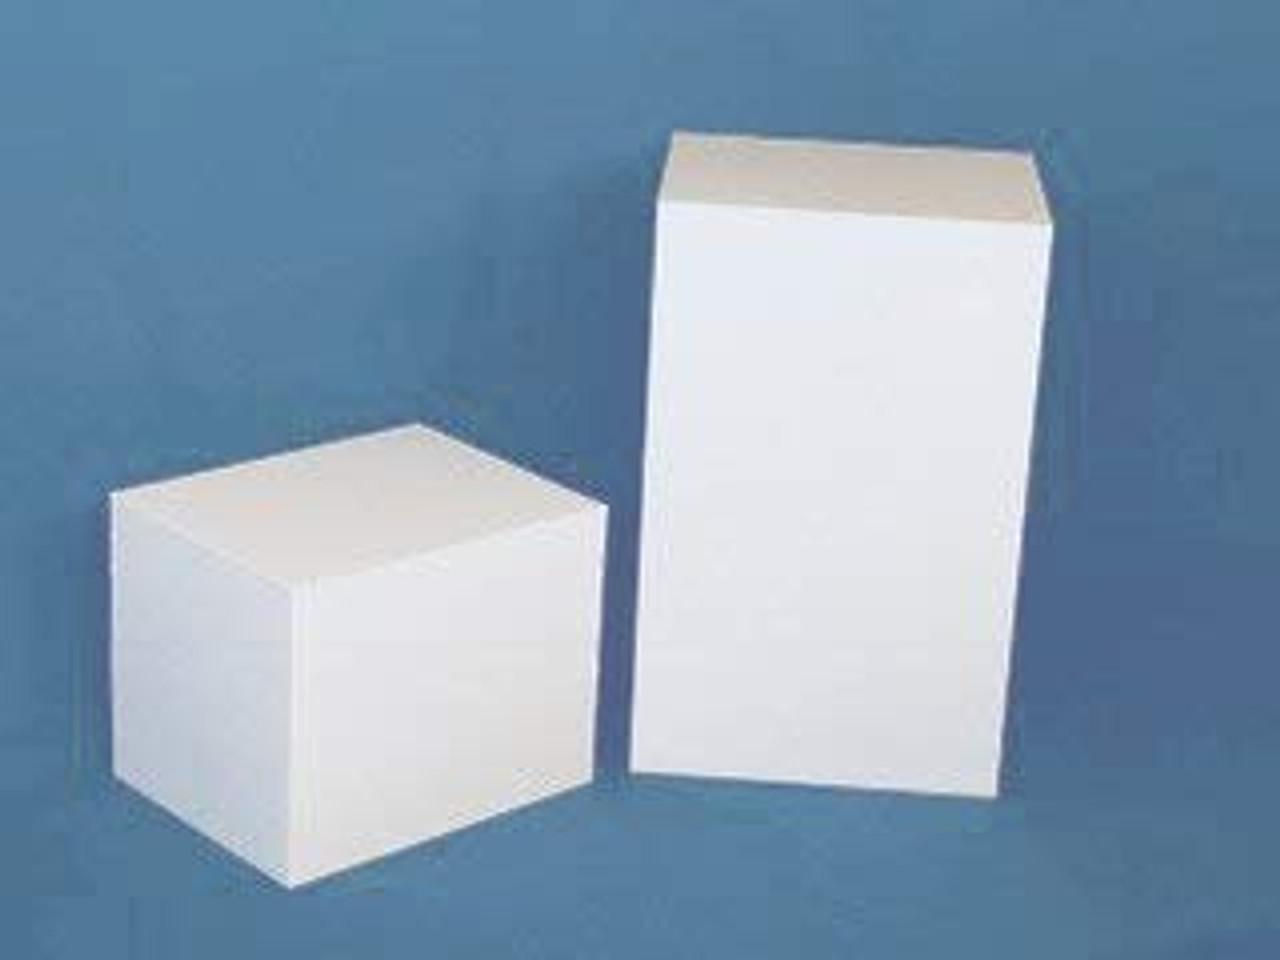 Rectangular Acrylic Display Cube - White, 36 Inch